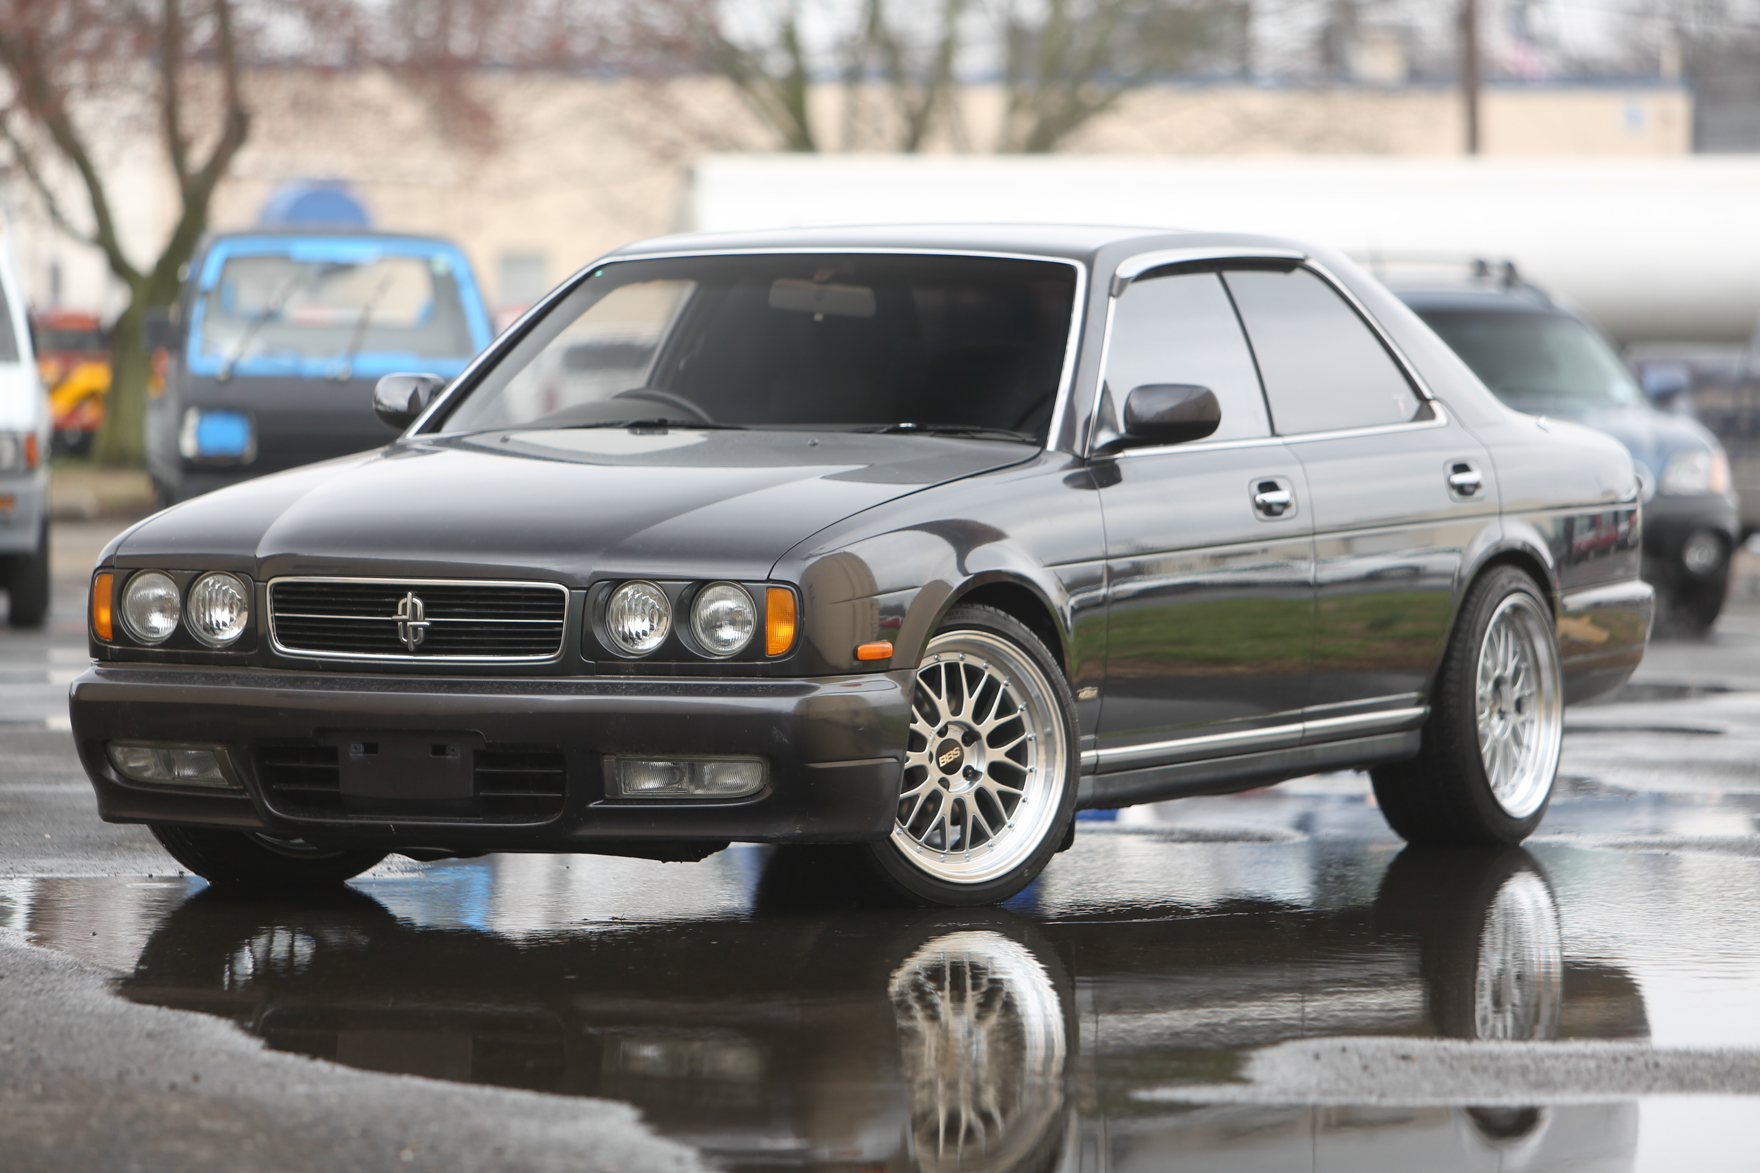 1992 Nissan Gloria Grand Turismo Turbo - $7,450